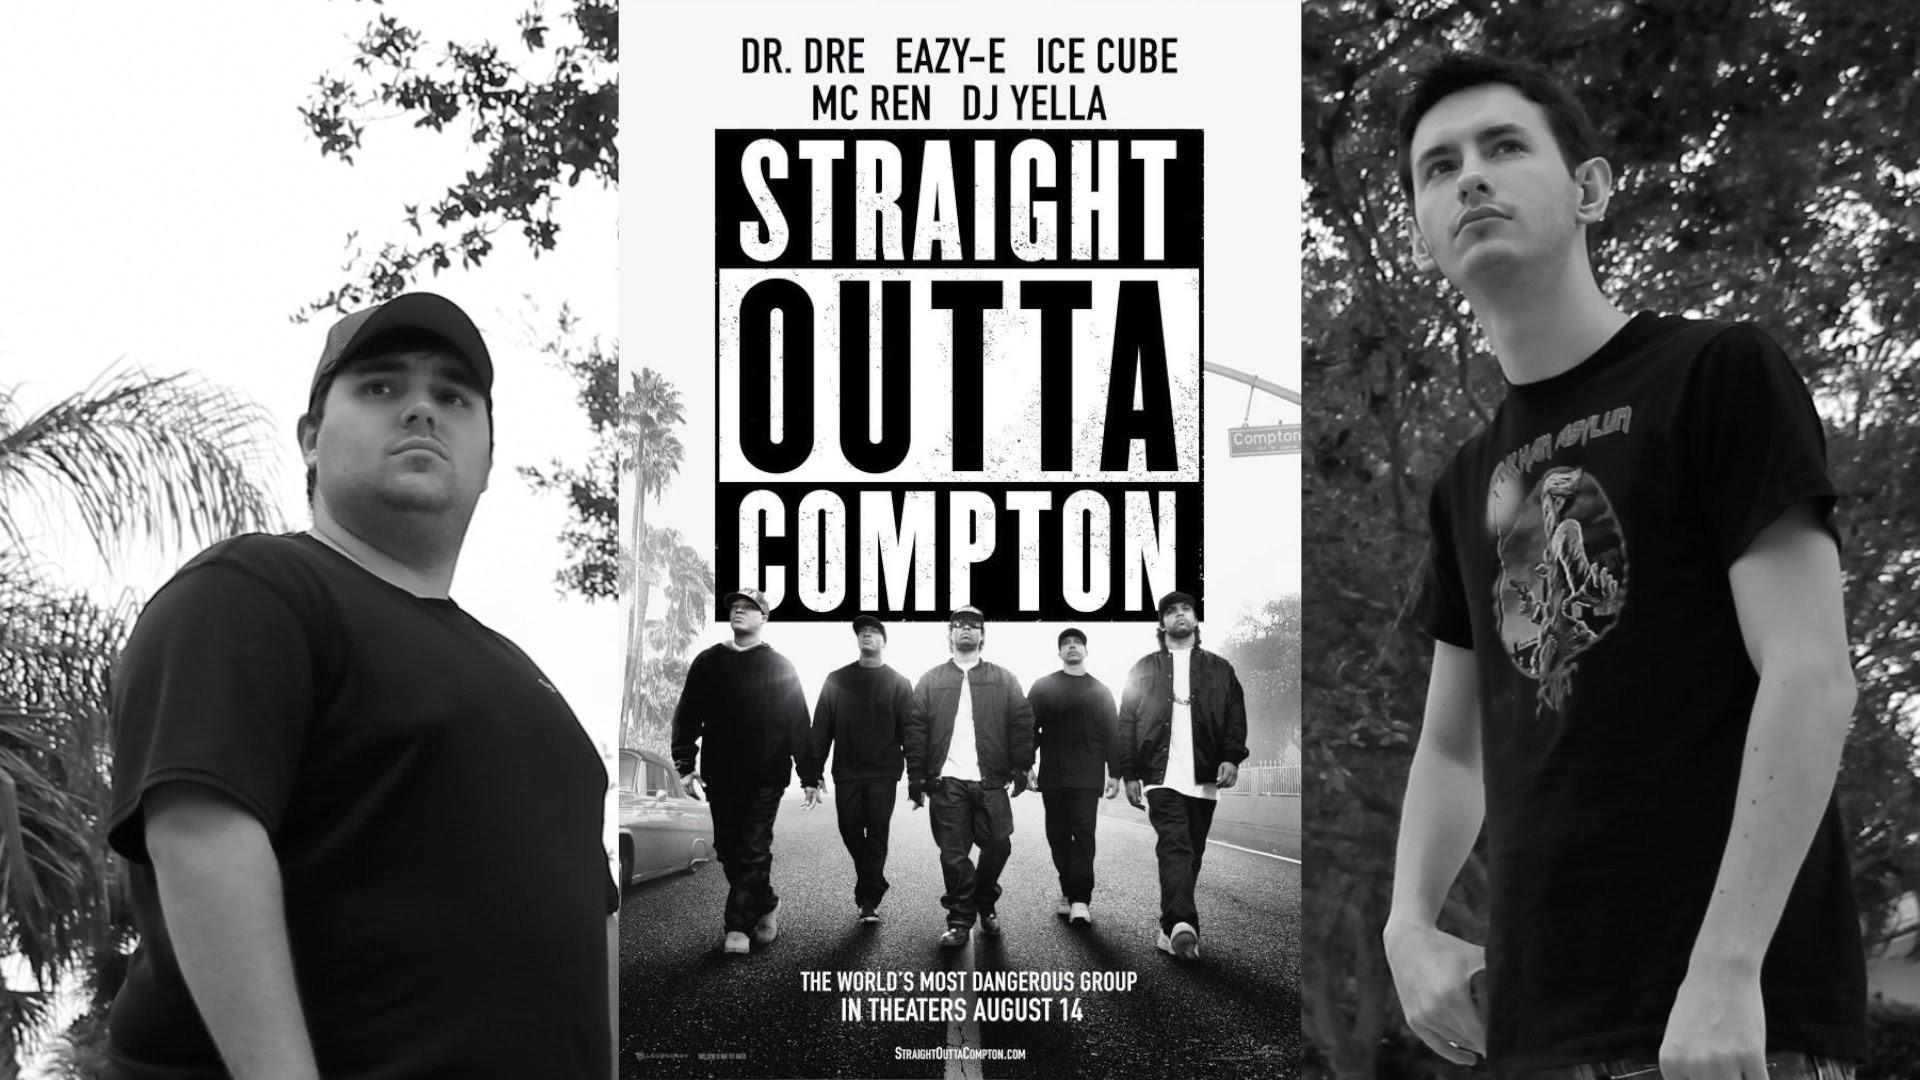 Res: 1920x1080, STRAIGHT OUTTA COMPTON rap rapper hip hop gangsta nwa biography drama music  1soc poster .